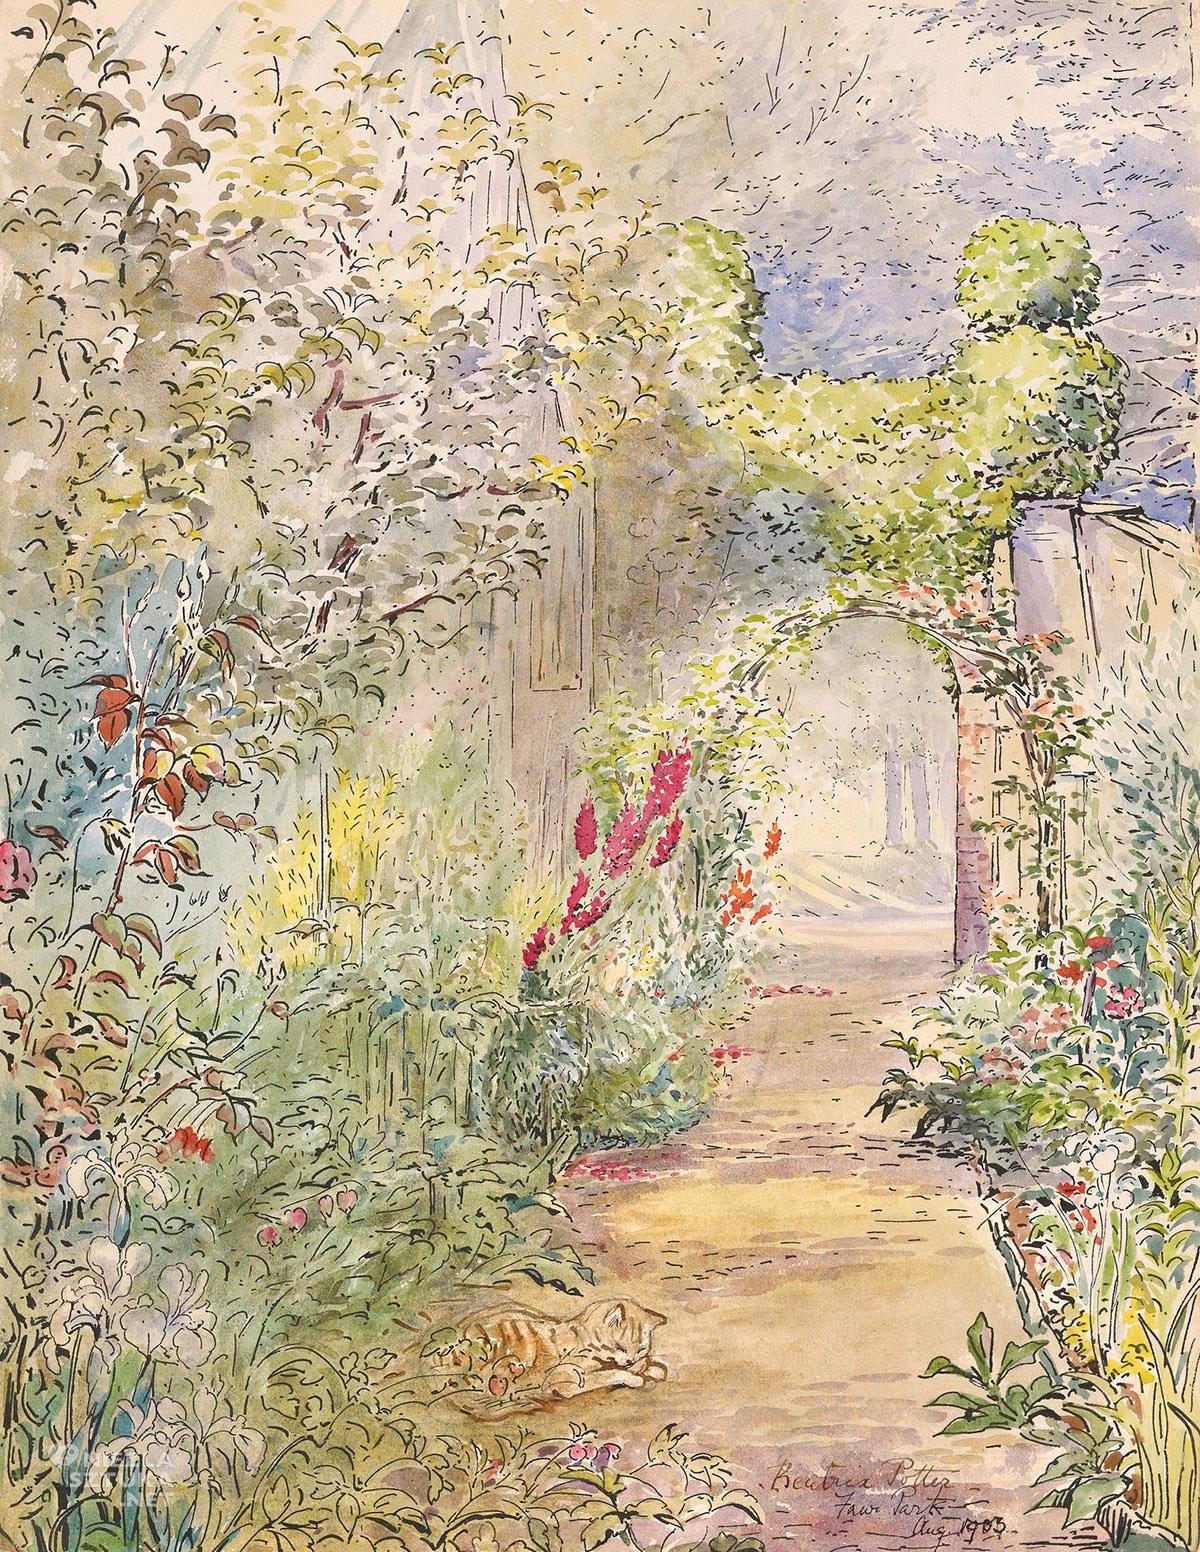 Beatrix Potter, Fawe Park Garden, akwarela, ilustratorka, kobiety w sztuce, Niezła Sztuka